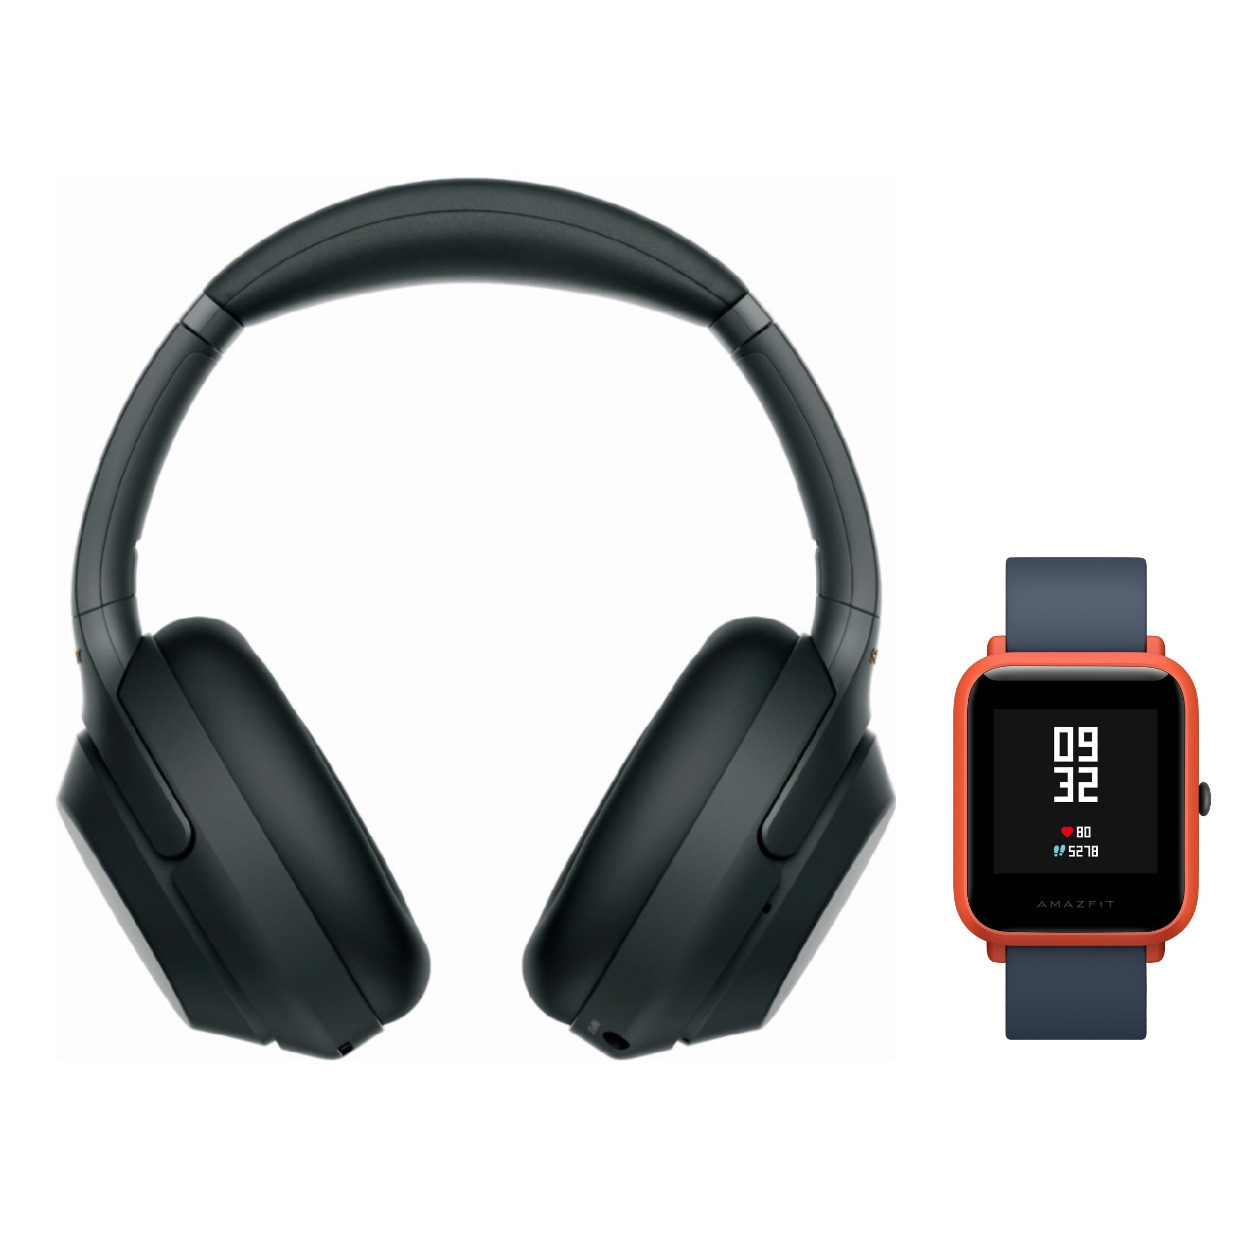 Sony WH-1000XM3 Wireless Headphones (Black) with Amazfit Bip (Cinnabar Red)